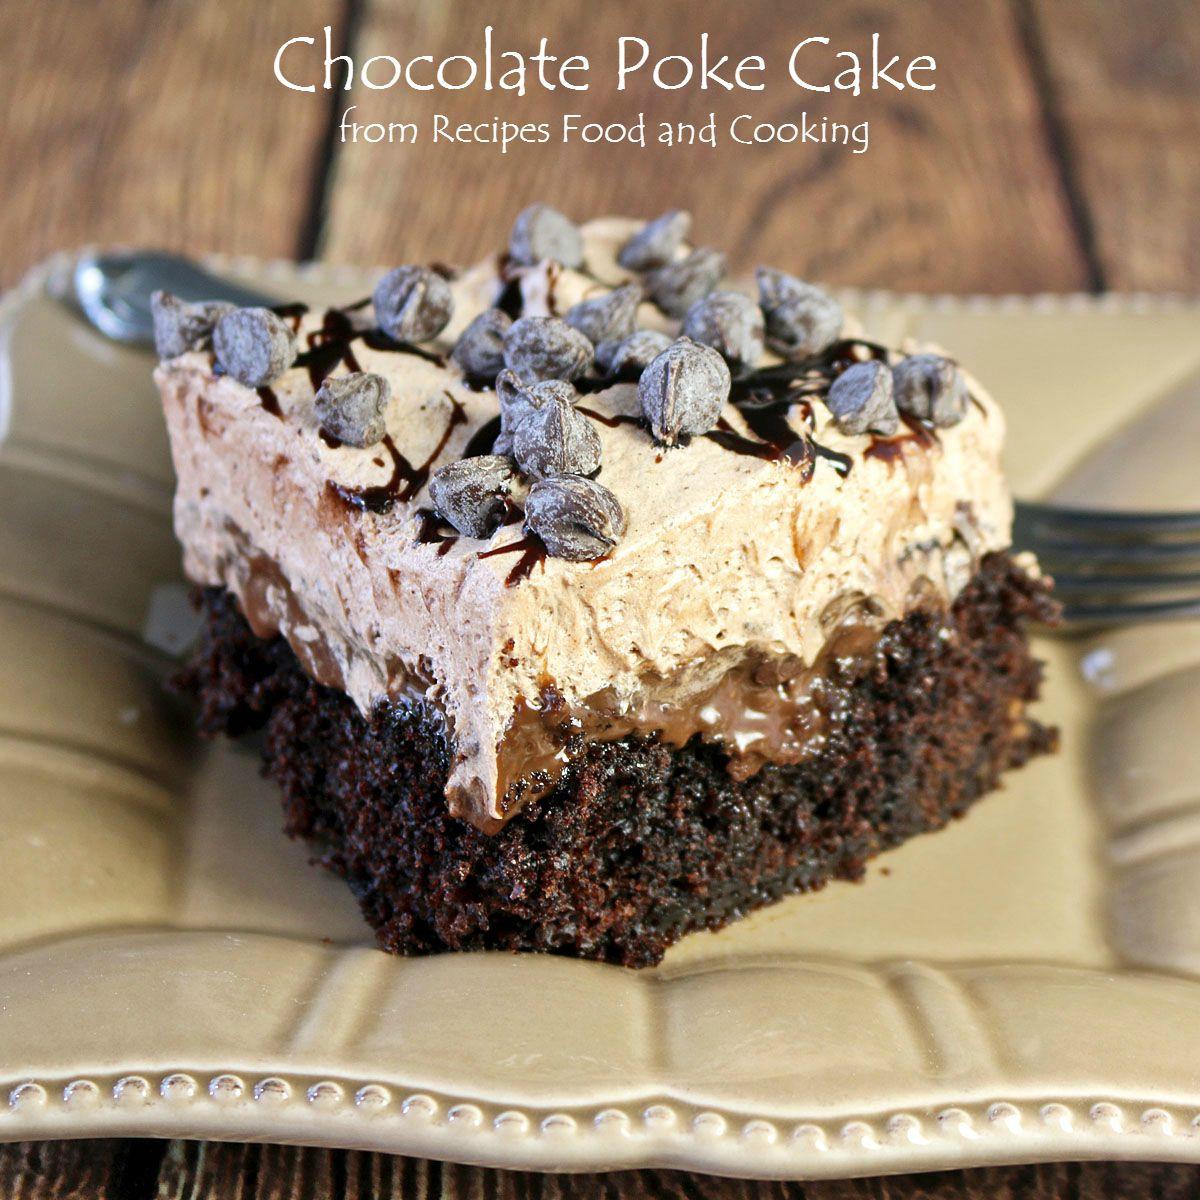 Chocolate Poke Cake Recipes  Chocolate Poke Cake Choctoberfest Recipes Food and Cooking